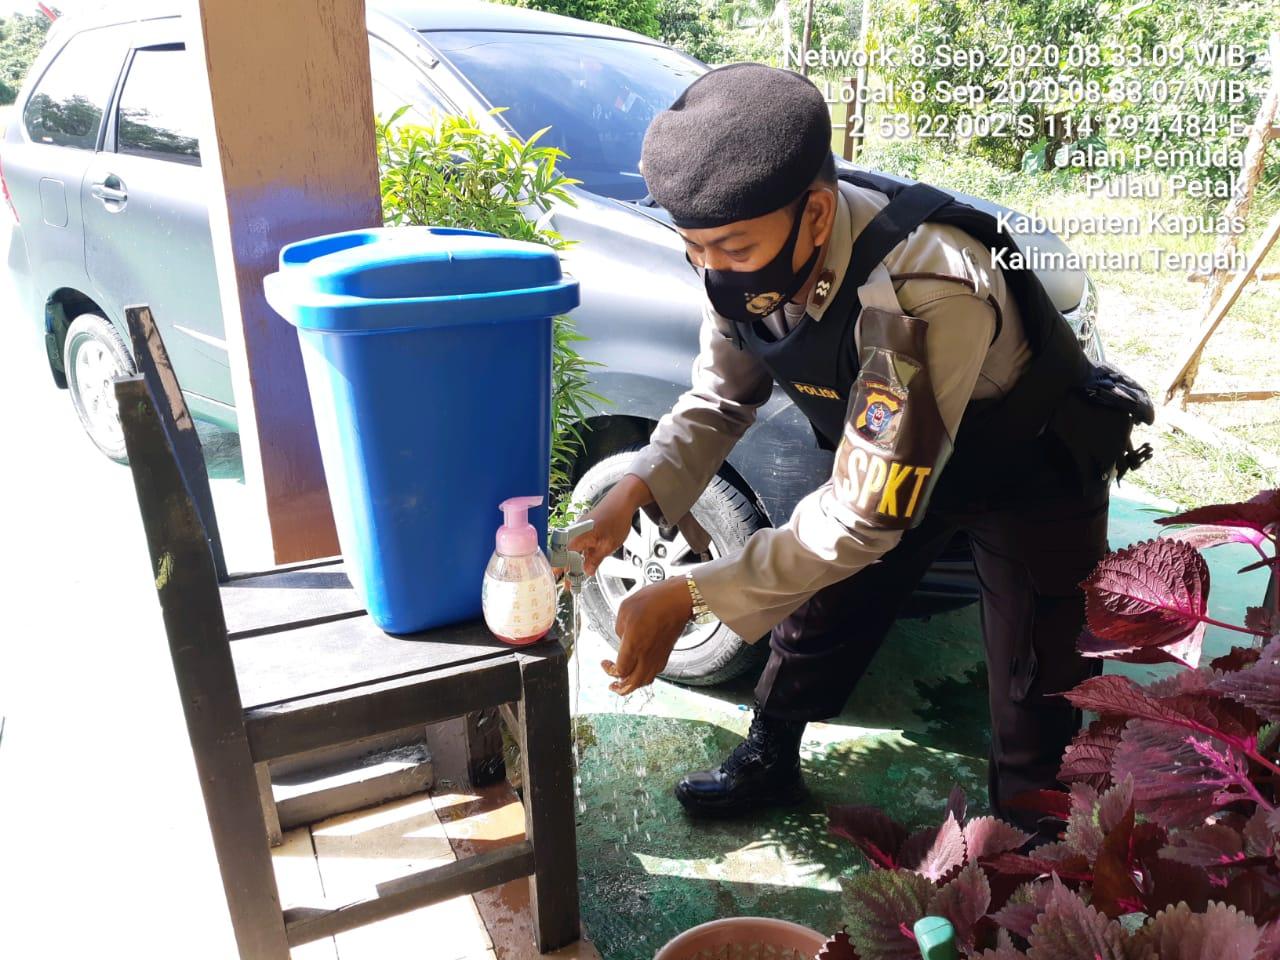 Memutus Penyebaran Covid-19, Piket Jaga Polsek Pulau Petak Laksanakan Penyemprotan Desinfektan